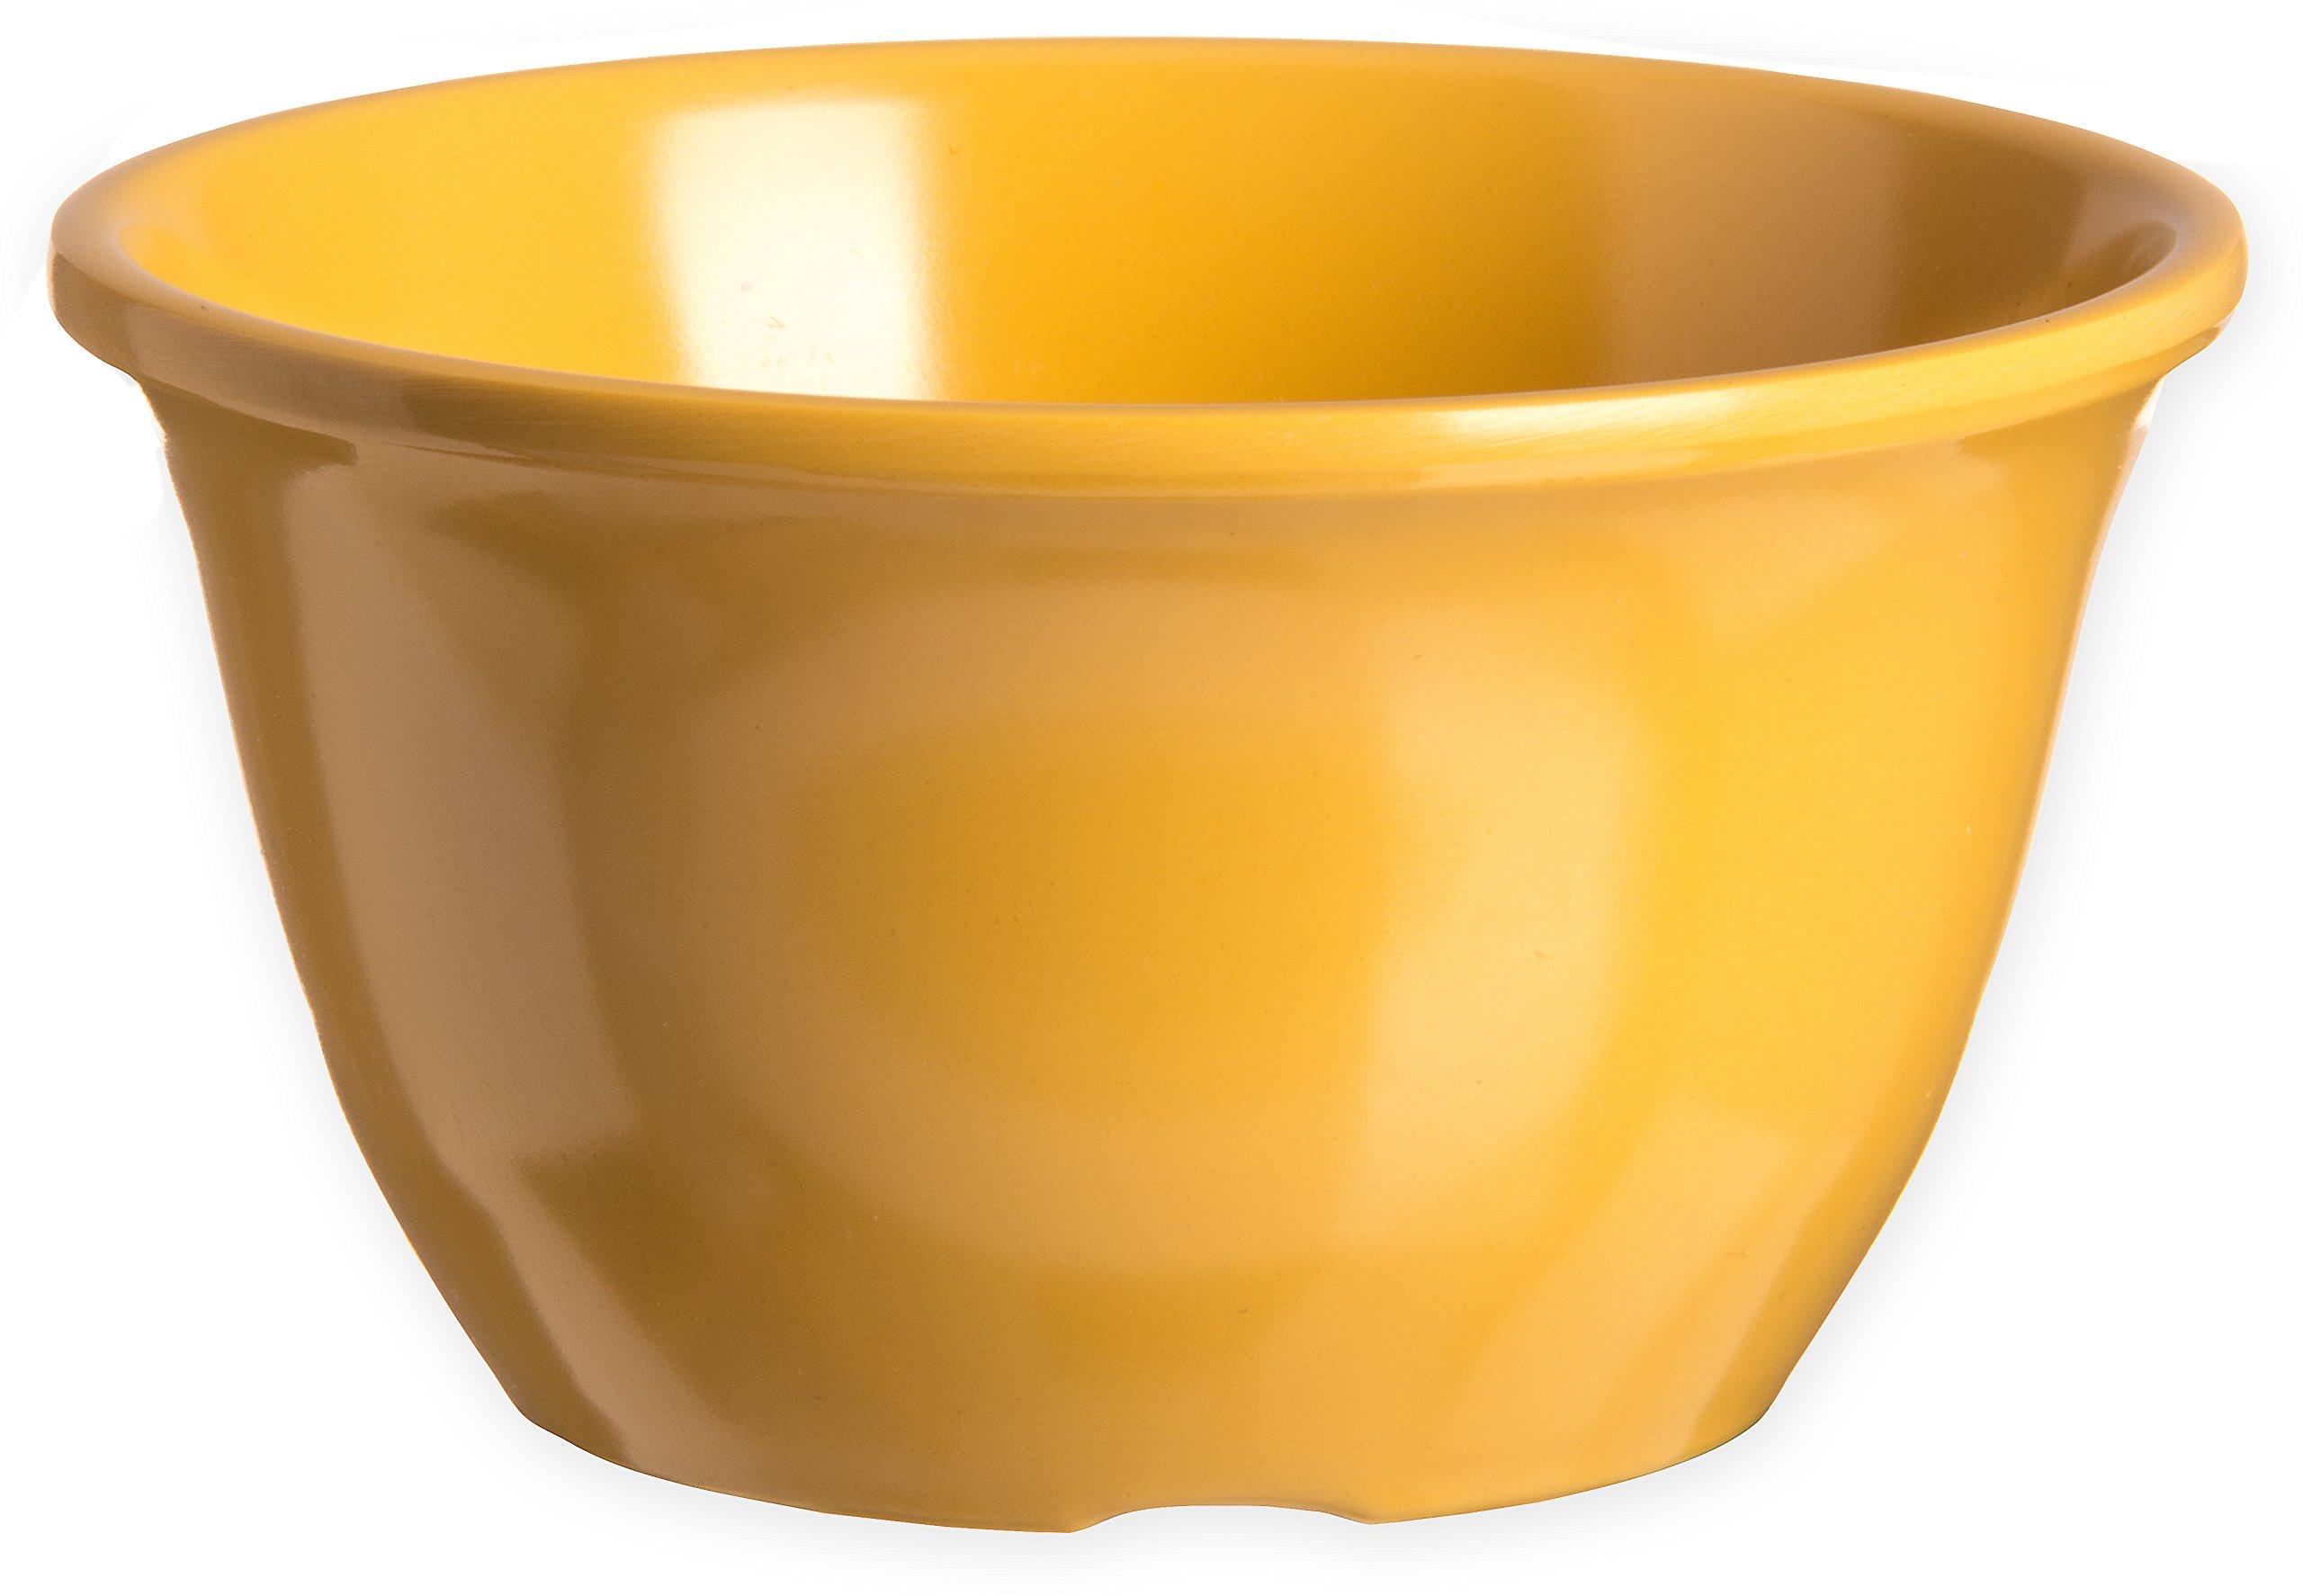 Carlisle 4305022 Durus Melamine Bouillon Cup, 11 Oz., Honey Yellow (Pack of 48) by Carlisle (Image #1)